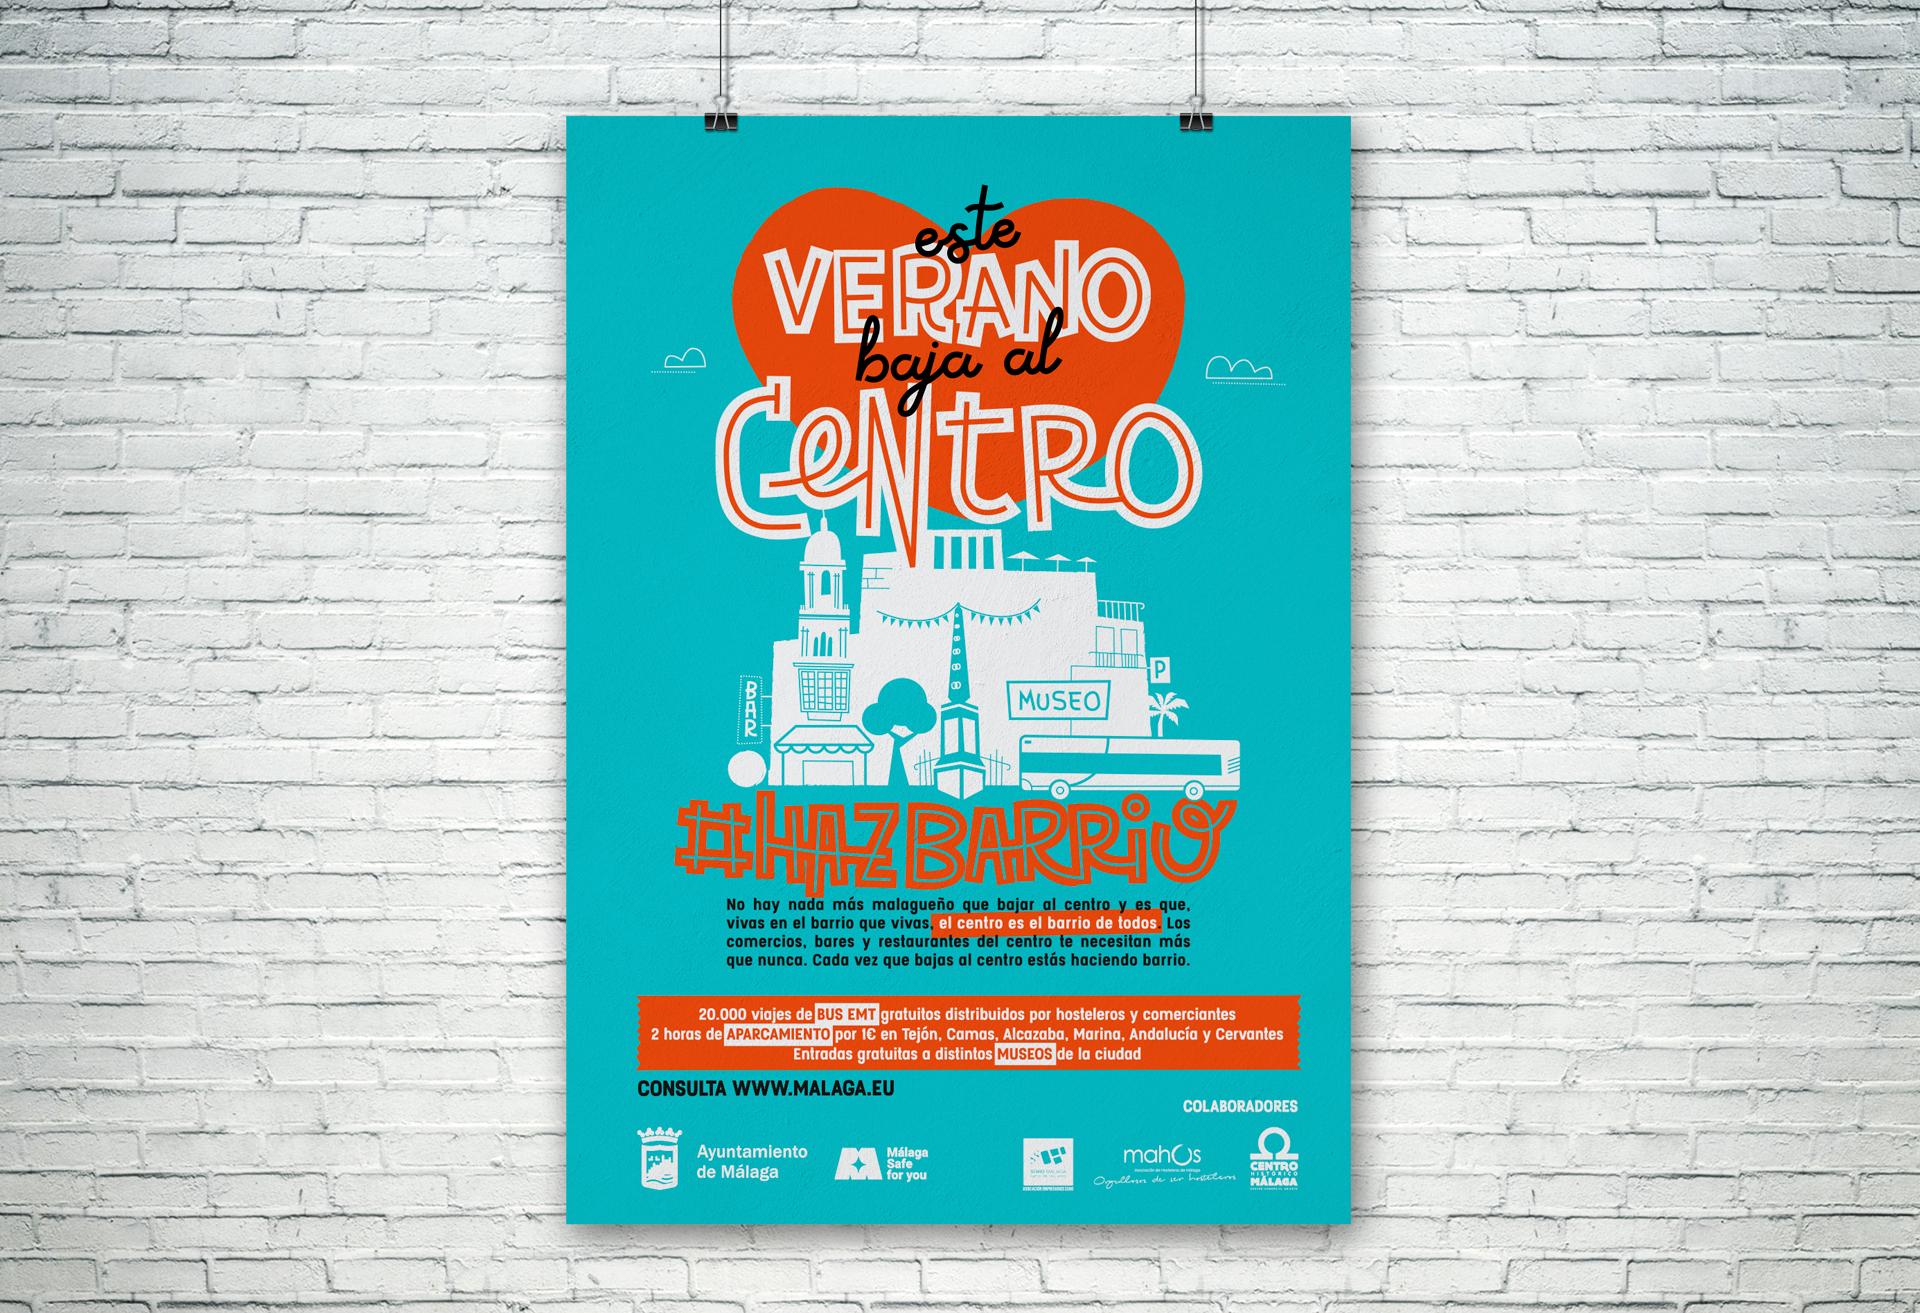 lamadredelosbeatles_hazbarrio_centro_poster_1